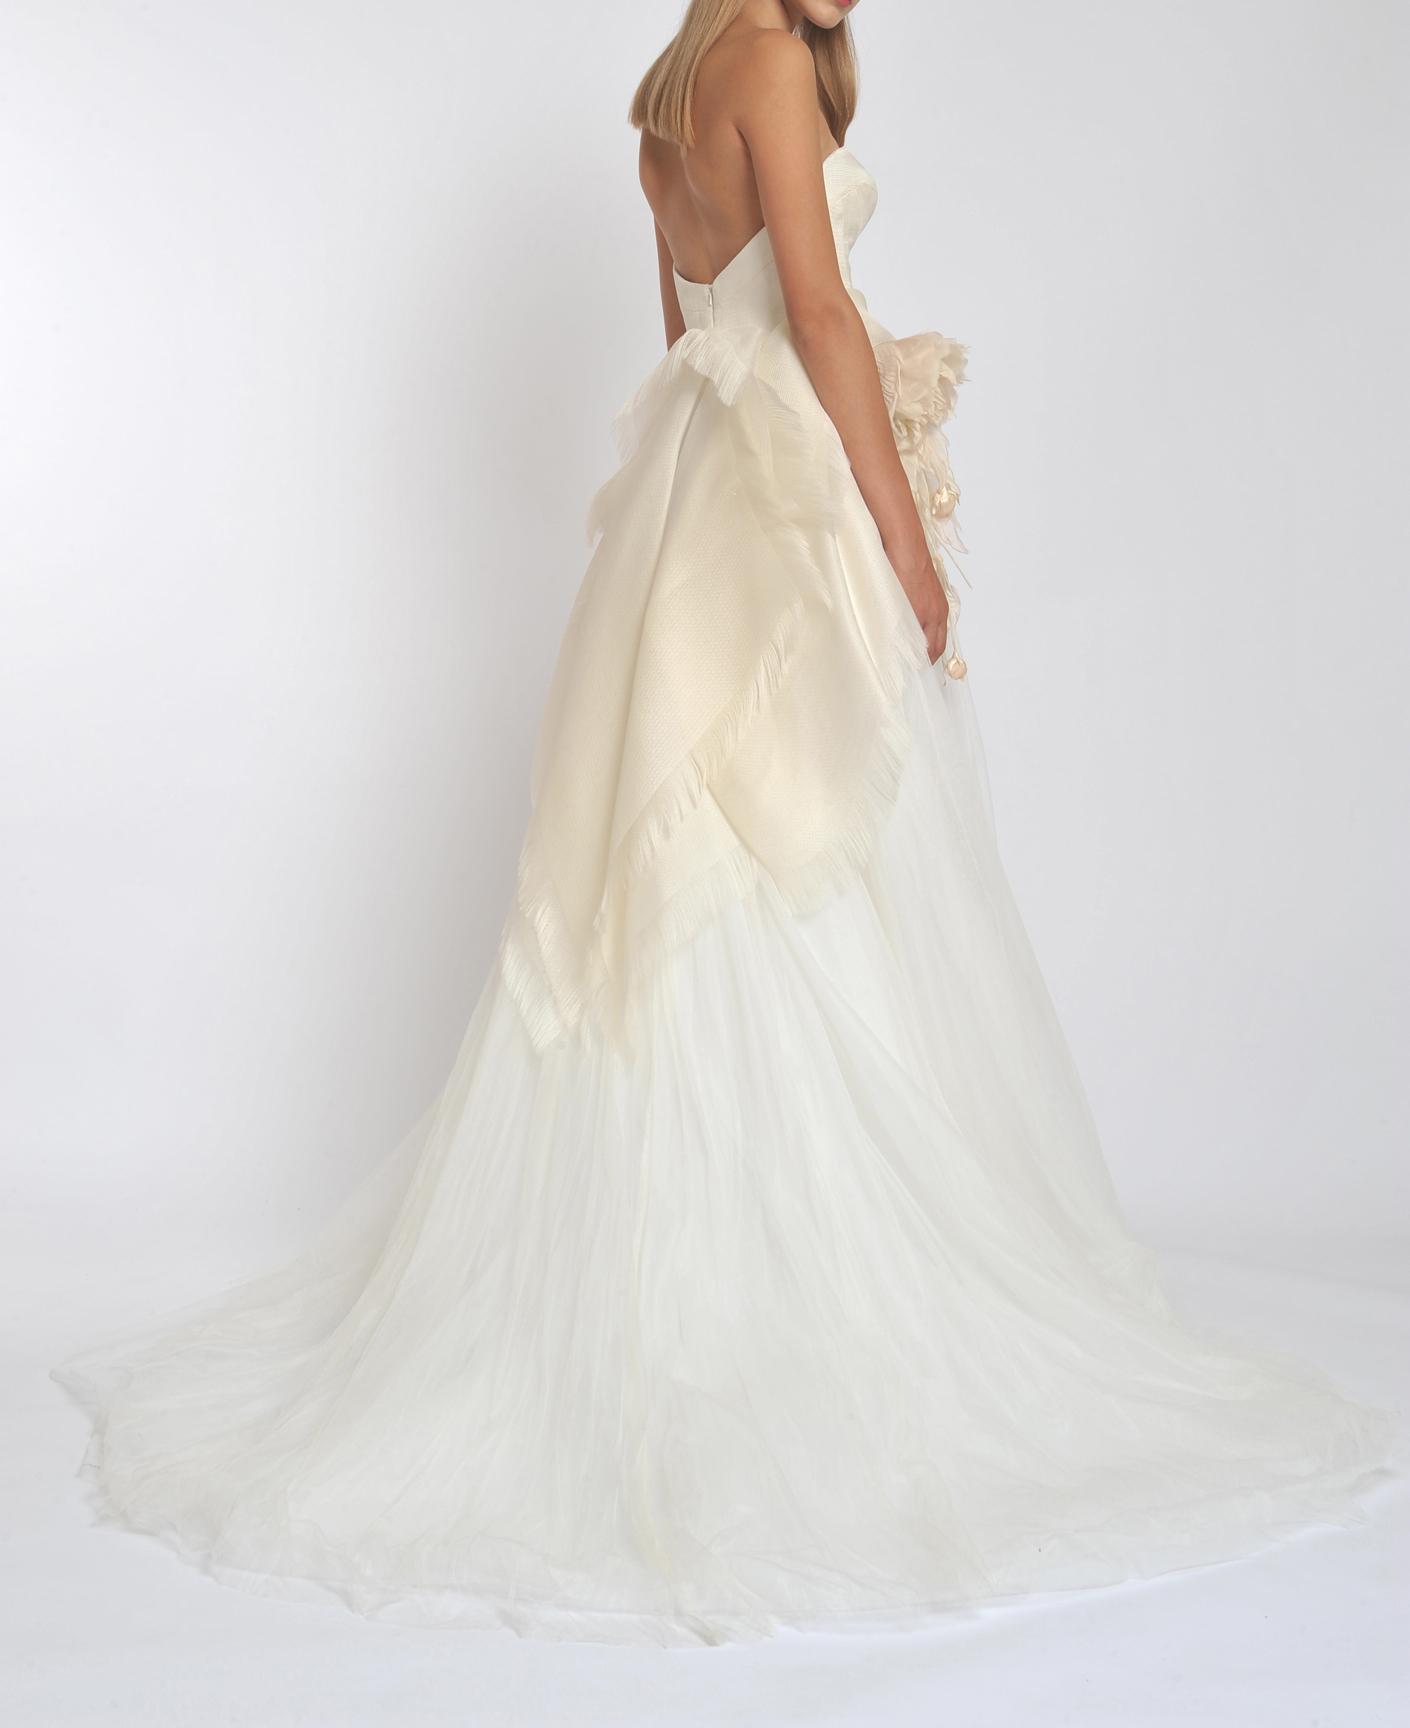 Straight Neck Strapless Tulle Skirt A-line Wedding Dress